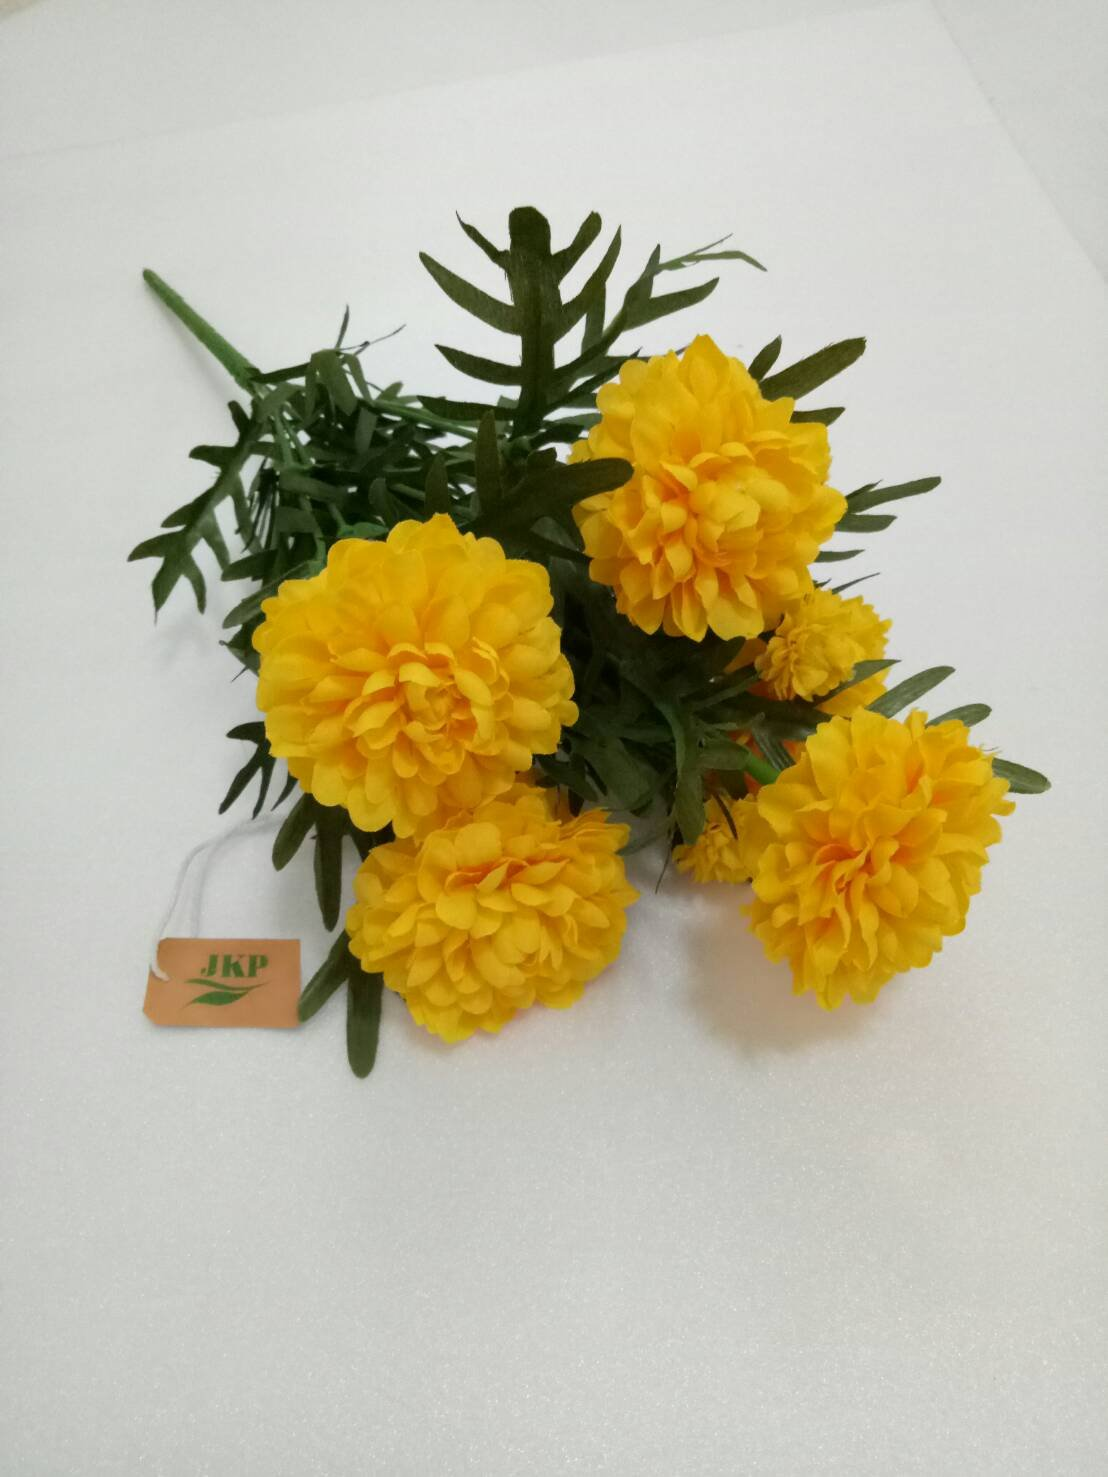 Thai Artificial Yellow Marigold Bunch, Artificial flowers, Marigold flower, Yellow Flowers, Marigold Yellow, By Jakapan.